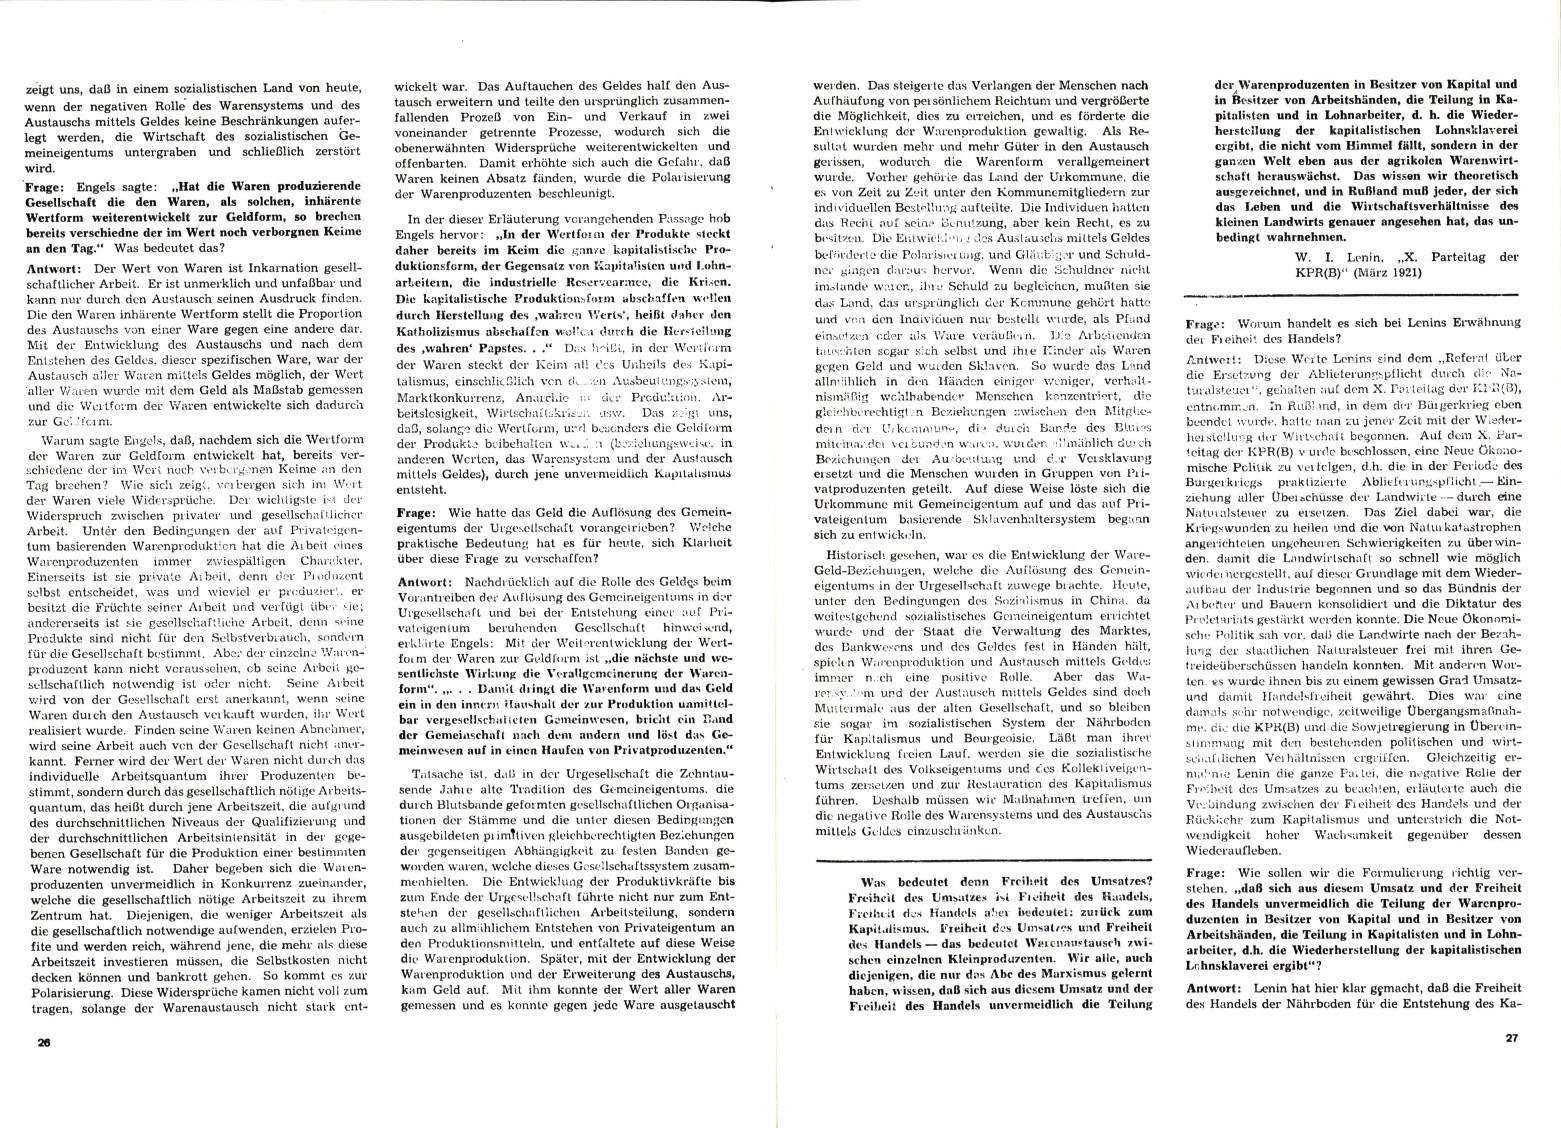 KPDAO_1976_Es_lebe_die_Diktatur_des_Proletariats_16